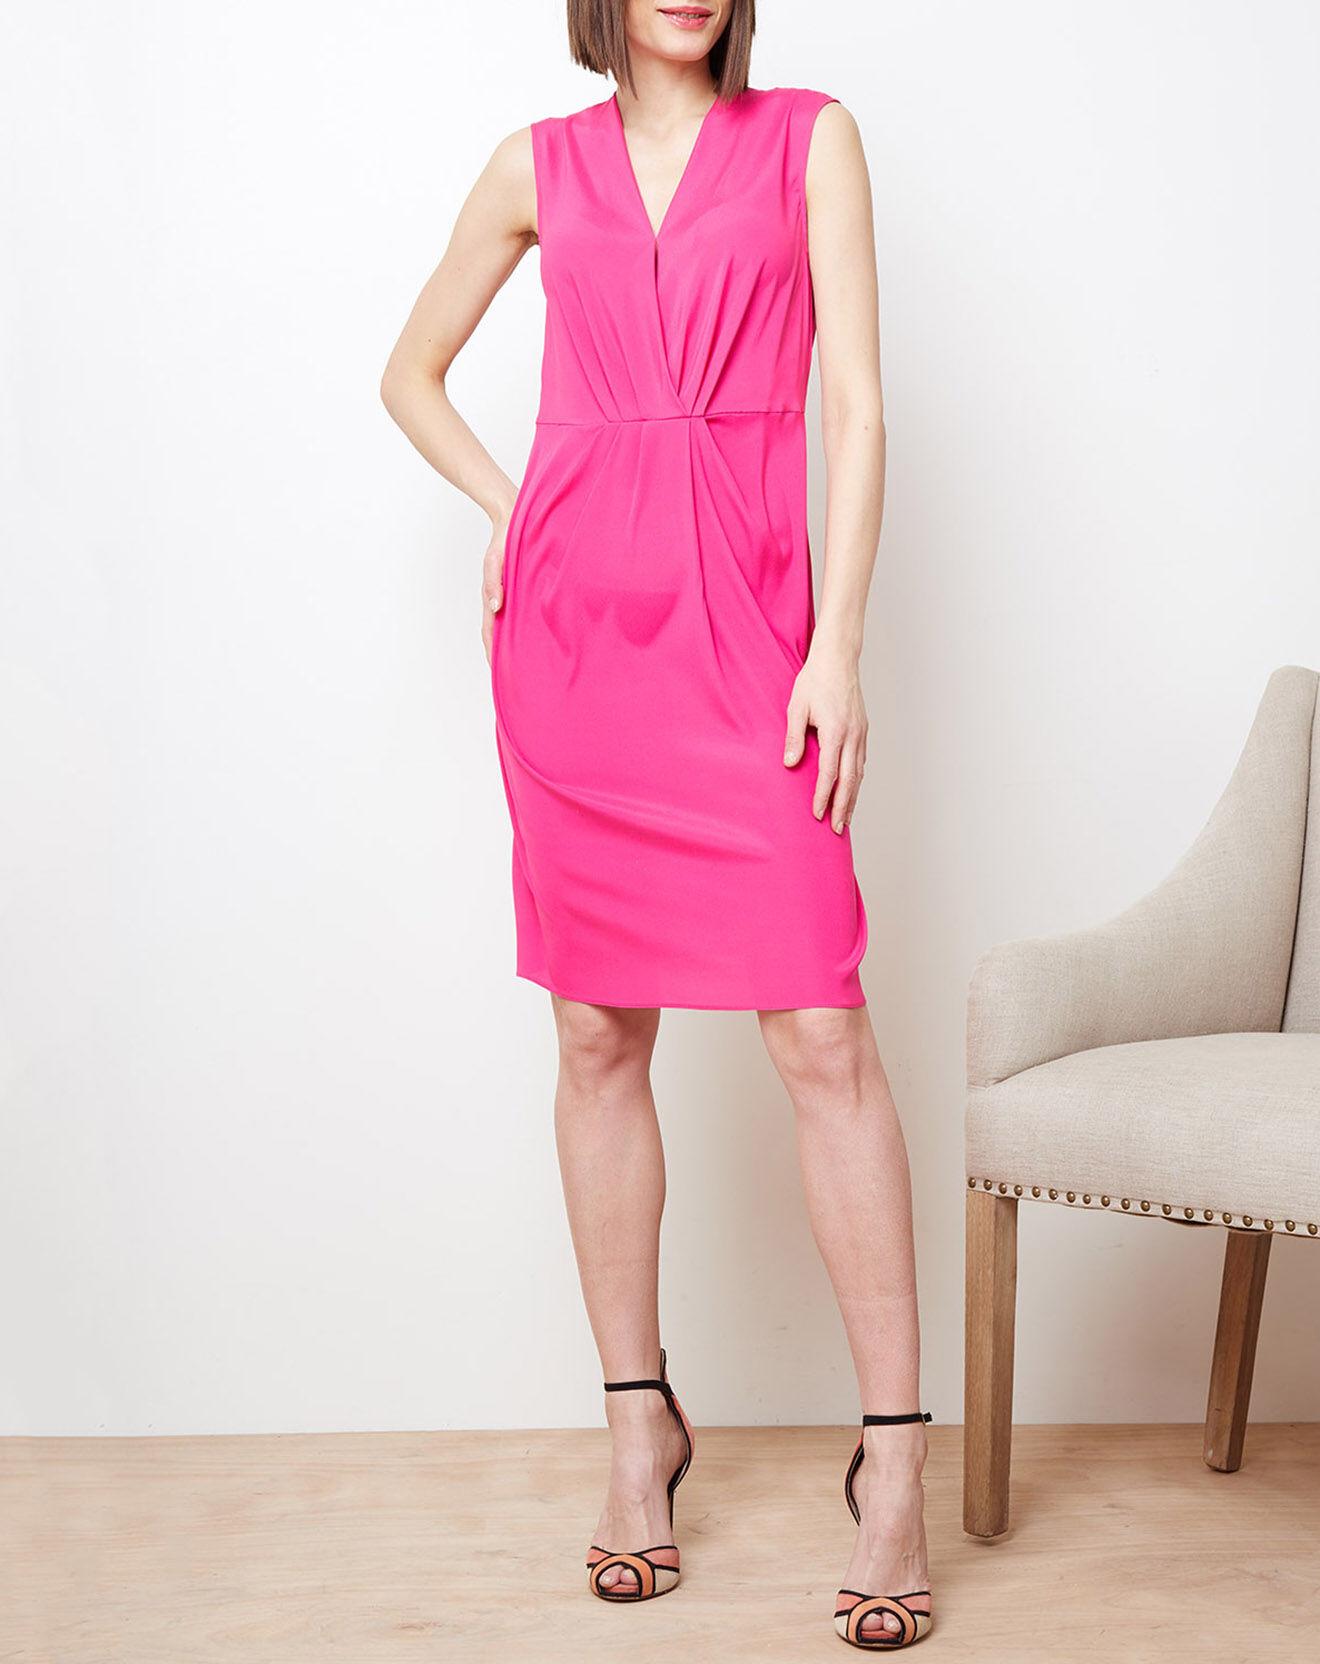 Robe drapée en Soie mélangée rose - Cacharel - Modalova